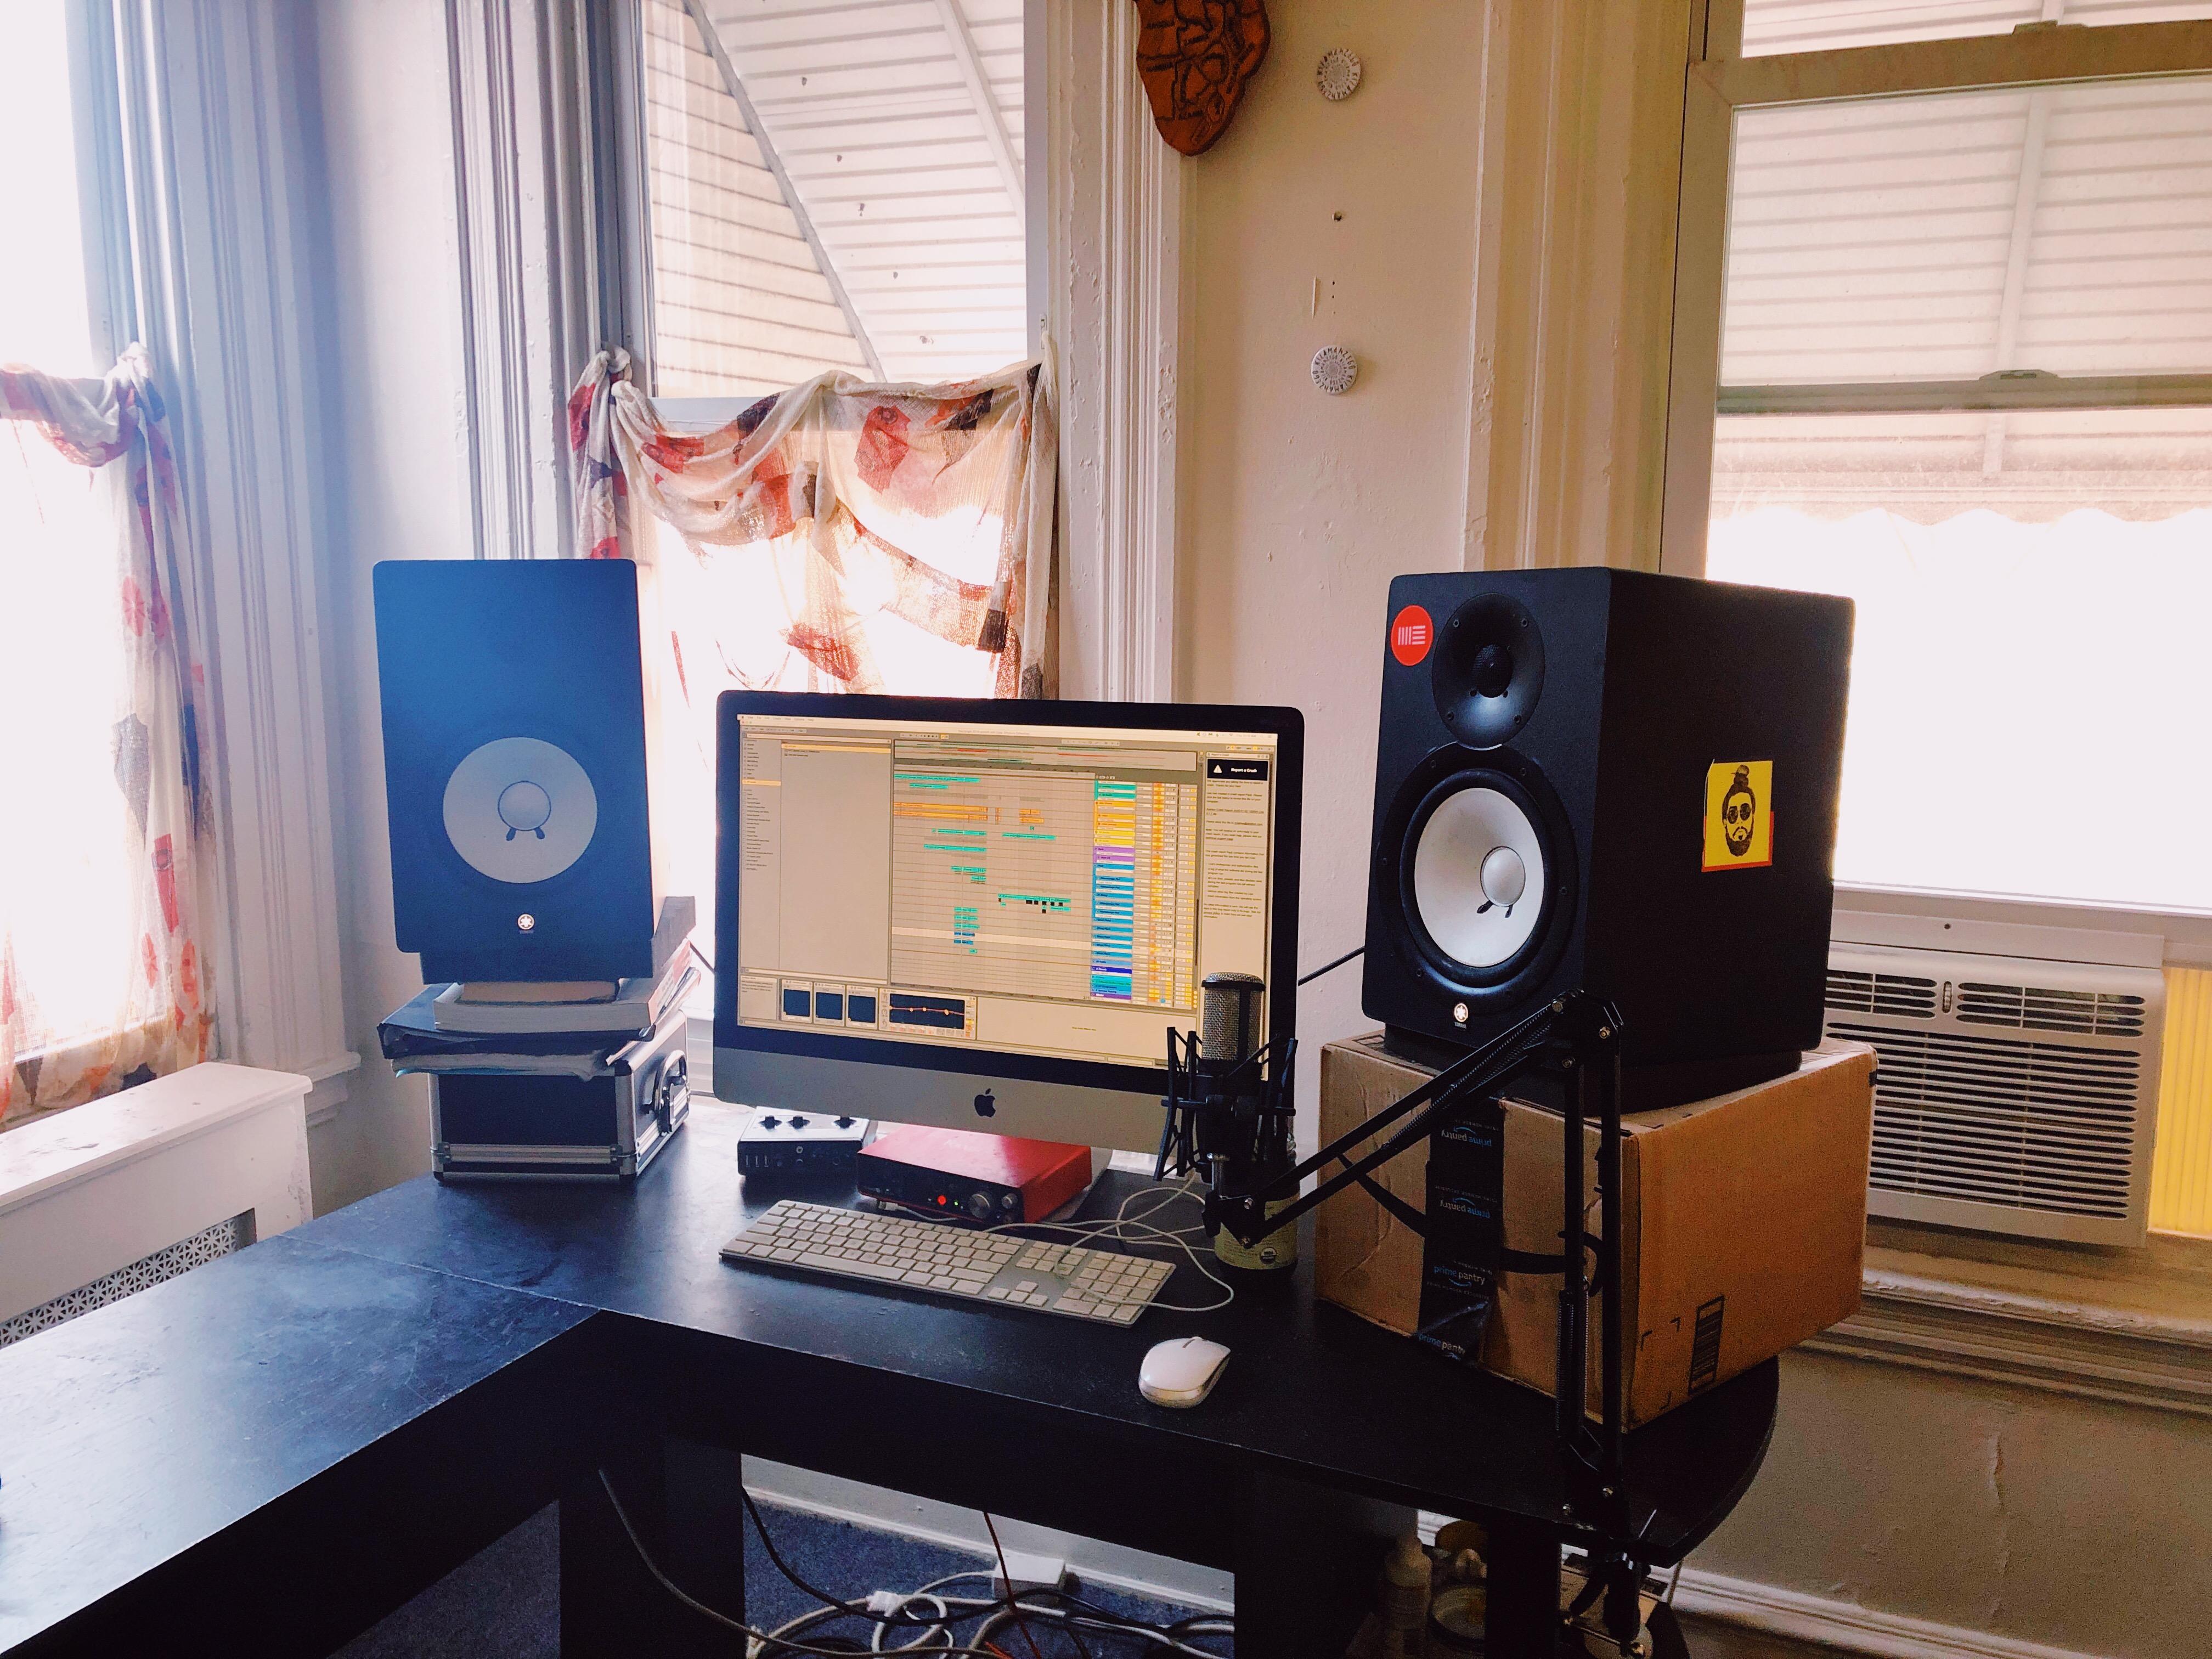 The producer's setup at home, a computer running Ableton Live and Yamaha monitors